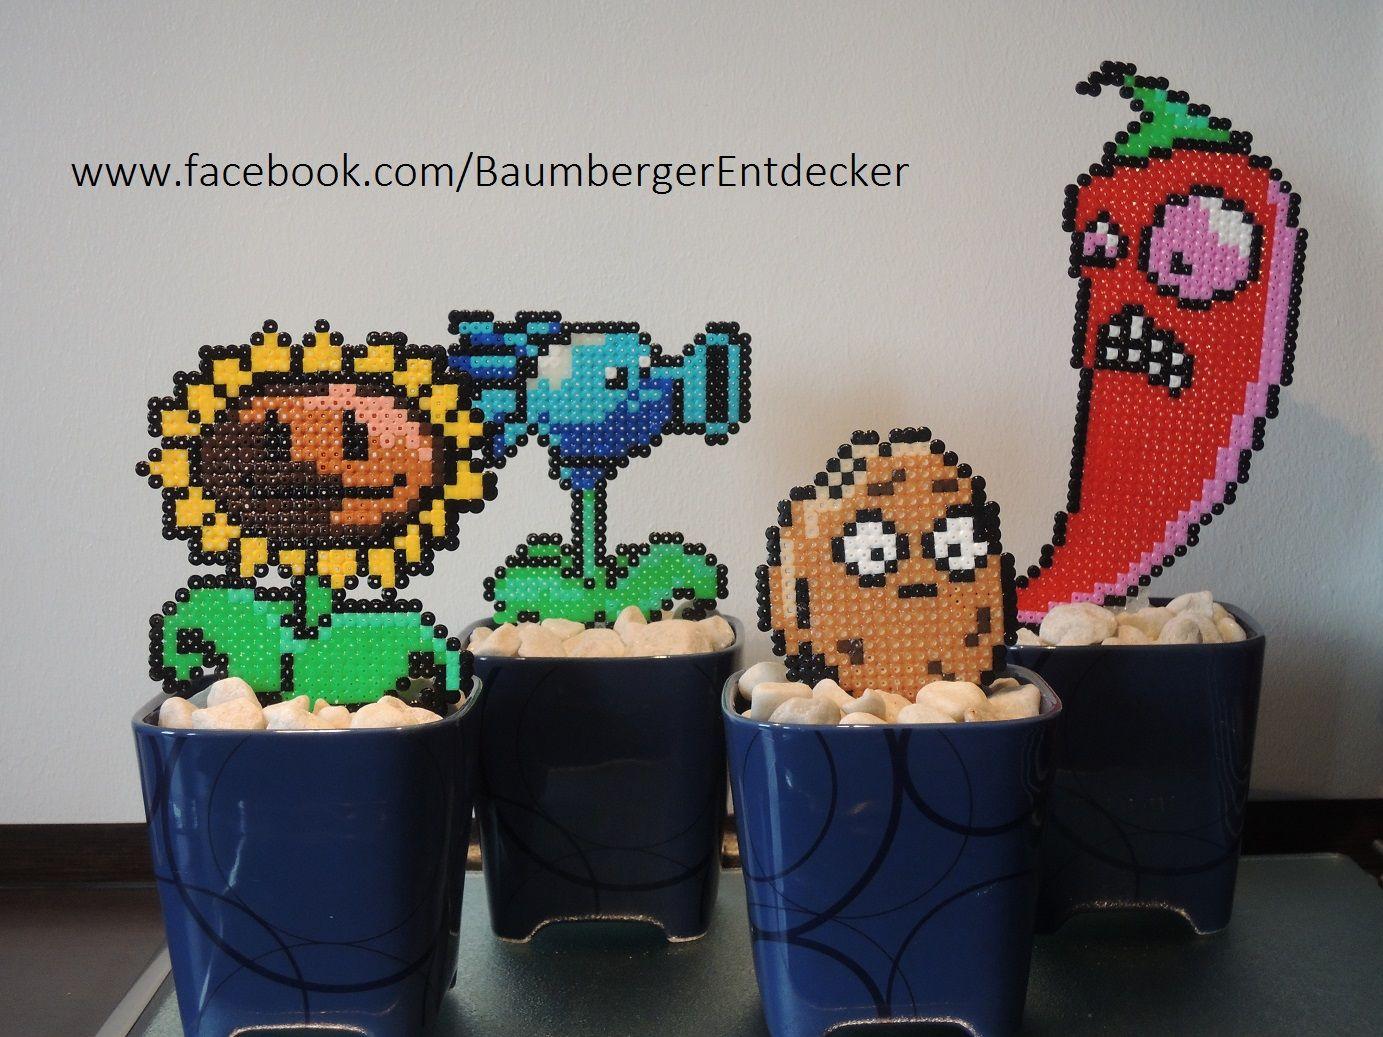 Zombie Vs Plants Garten Aus Bügelperlen Perler Beads Bügelperlen